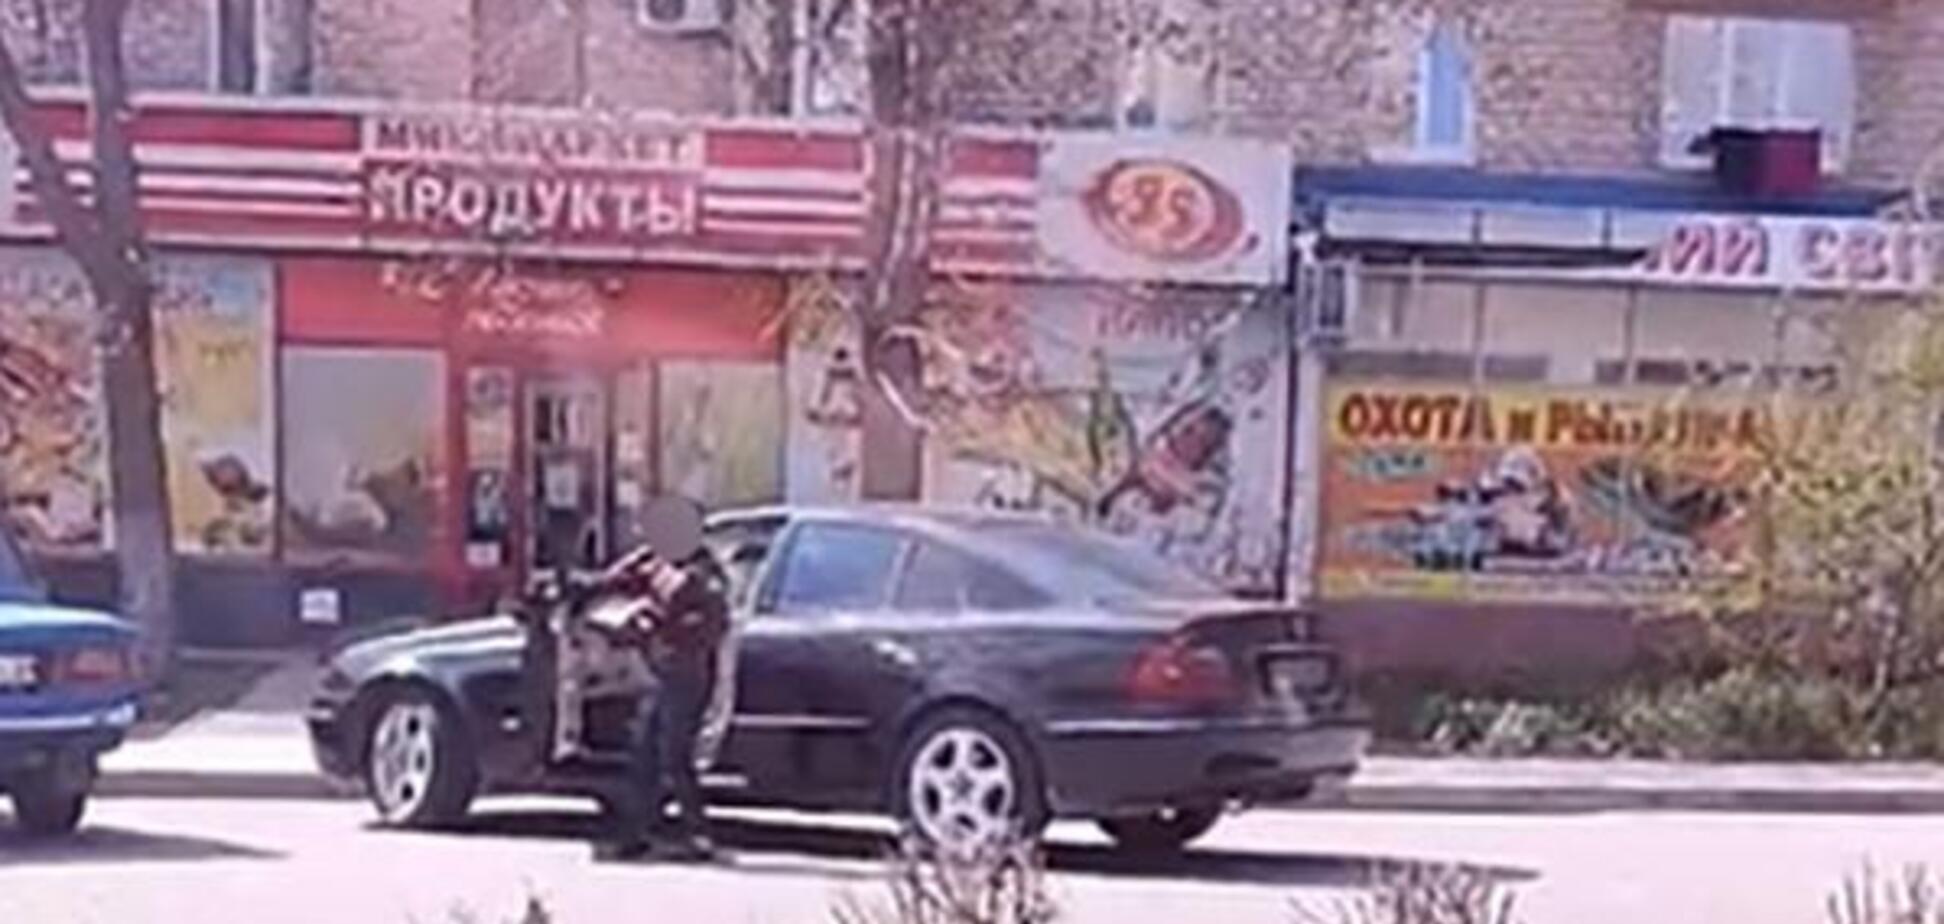 В 10 лет сам на 'Мерседесе': в Запорожской области засняли ребенка за рулем. Видео